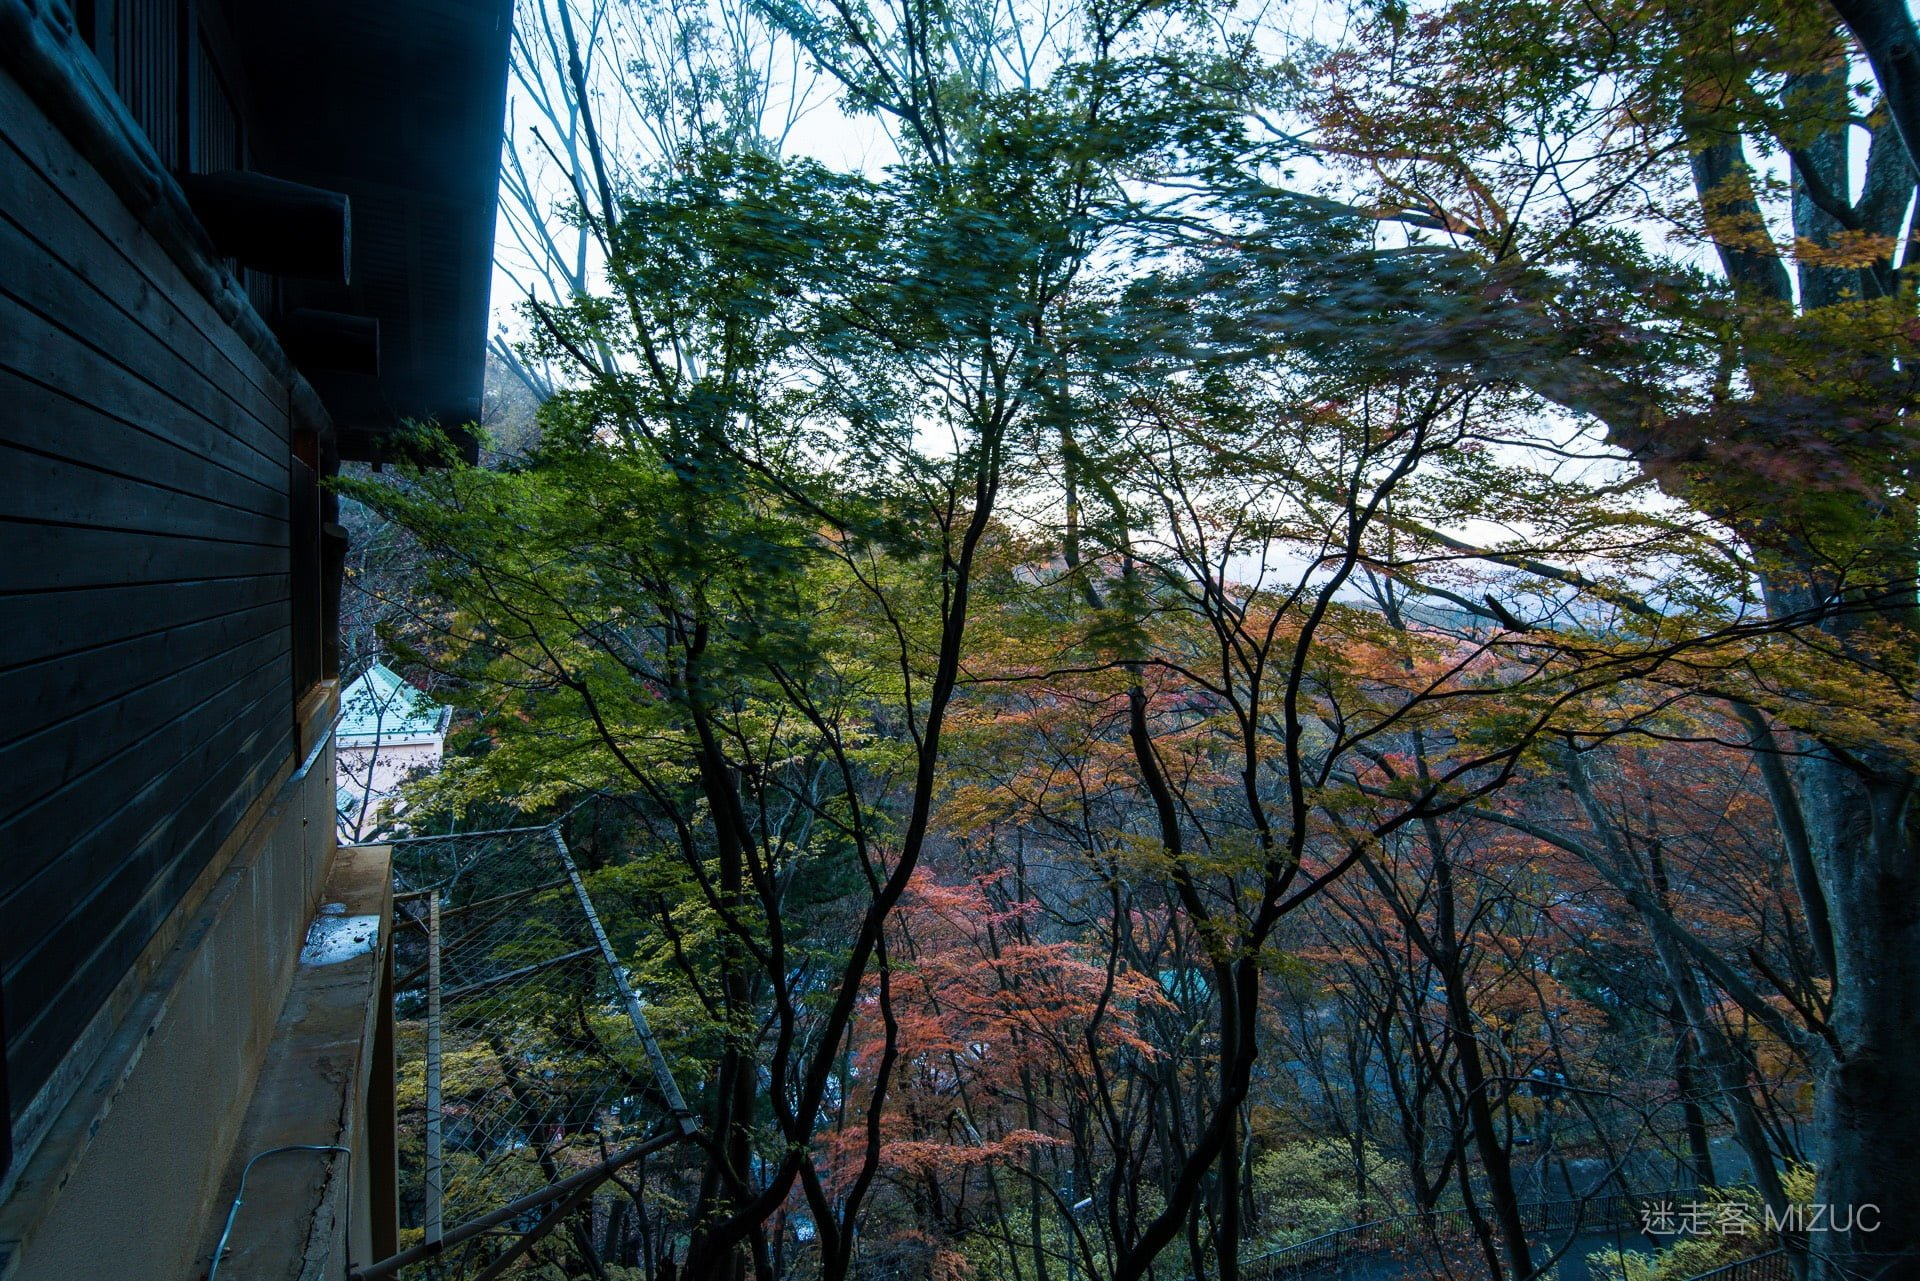 201711 Ibaraki Tochigi Gunma Japan Travel By RentalCar 72 日本自駕旅遊/北關東三縣「茨城、櫪木、群馬」秋天美食、溫泉與瀑布秘境百景(精選照片分享)